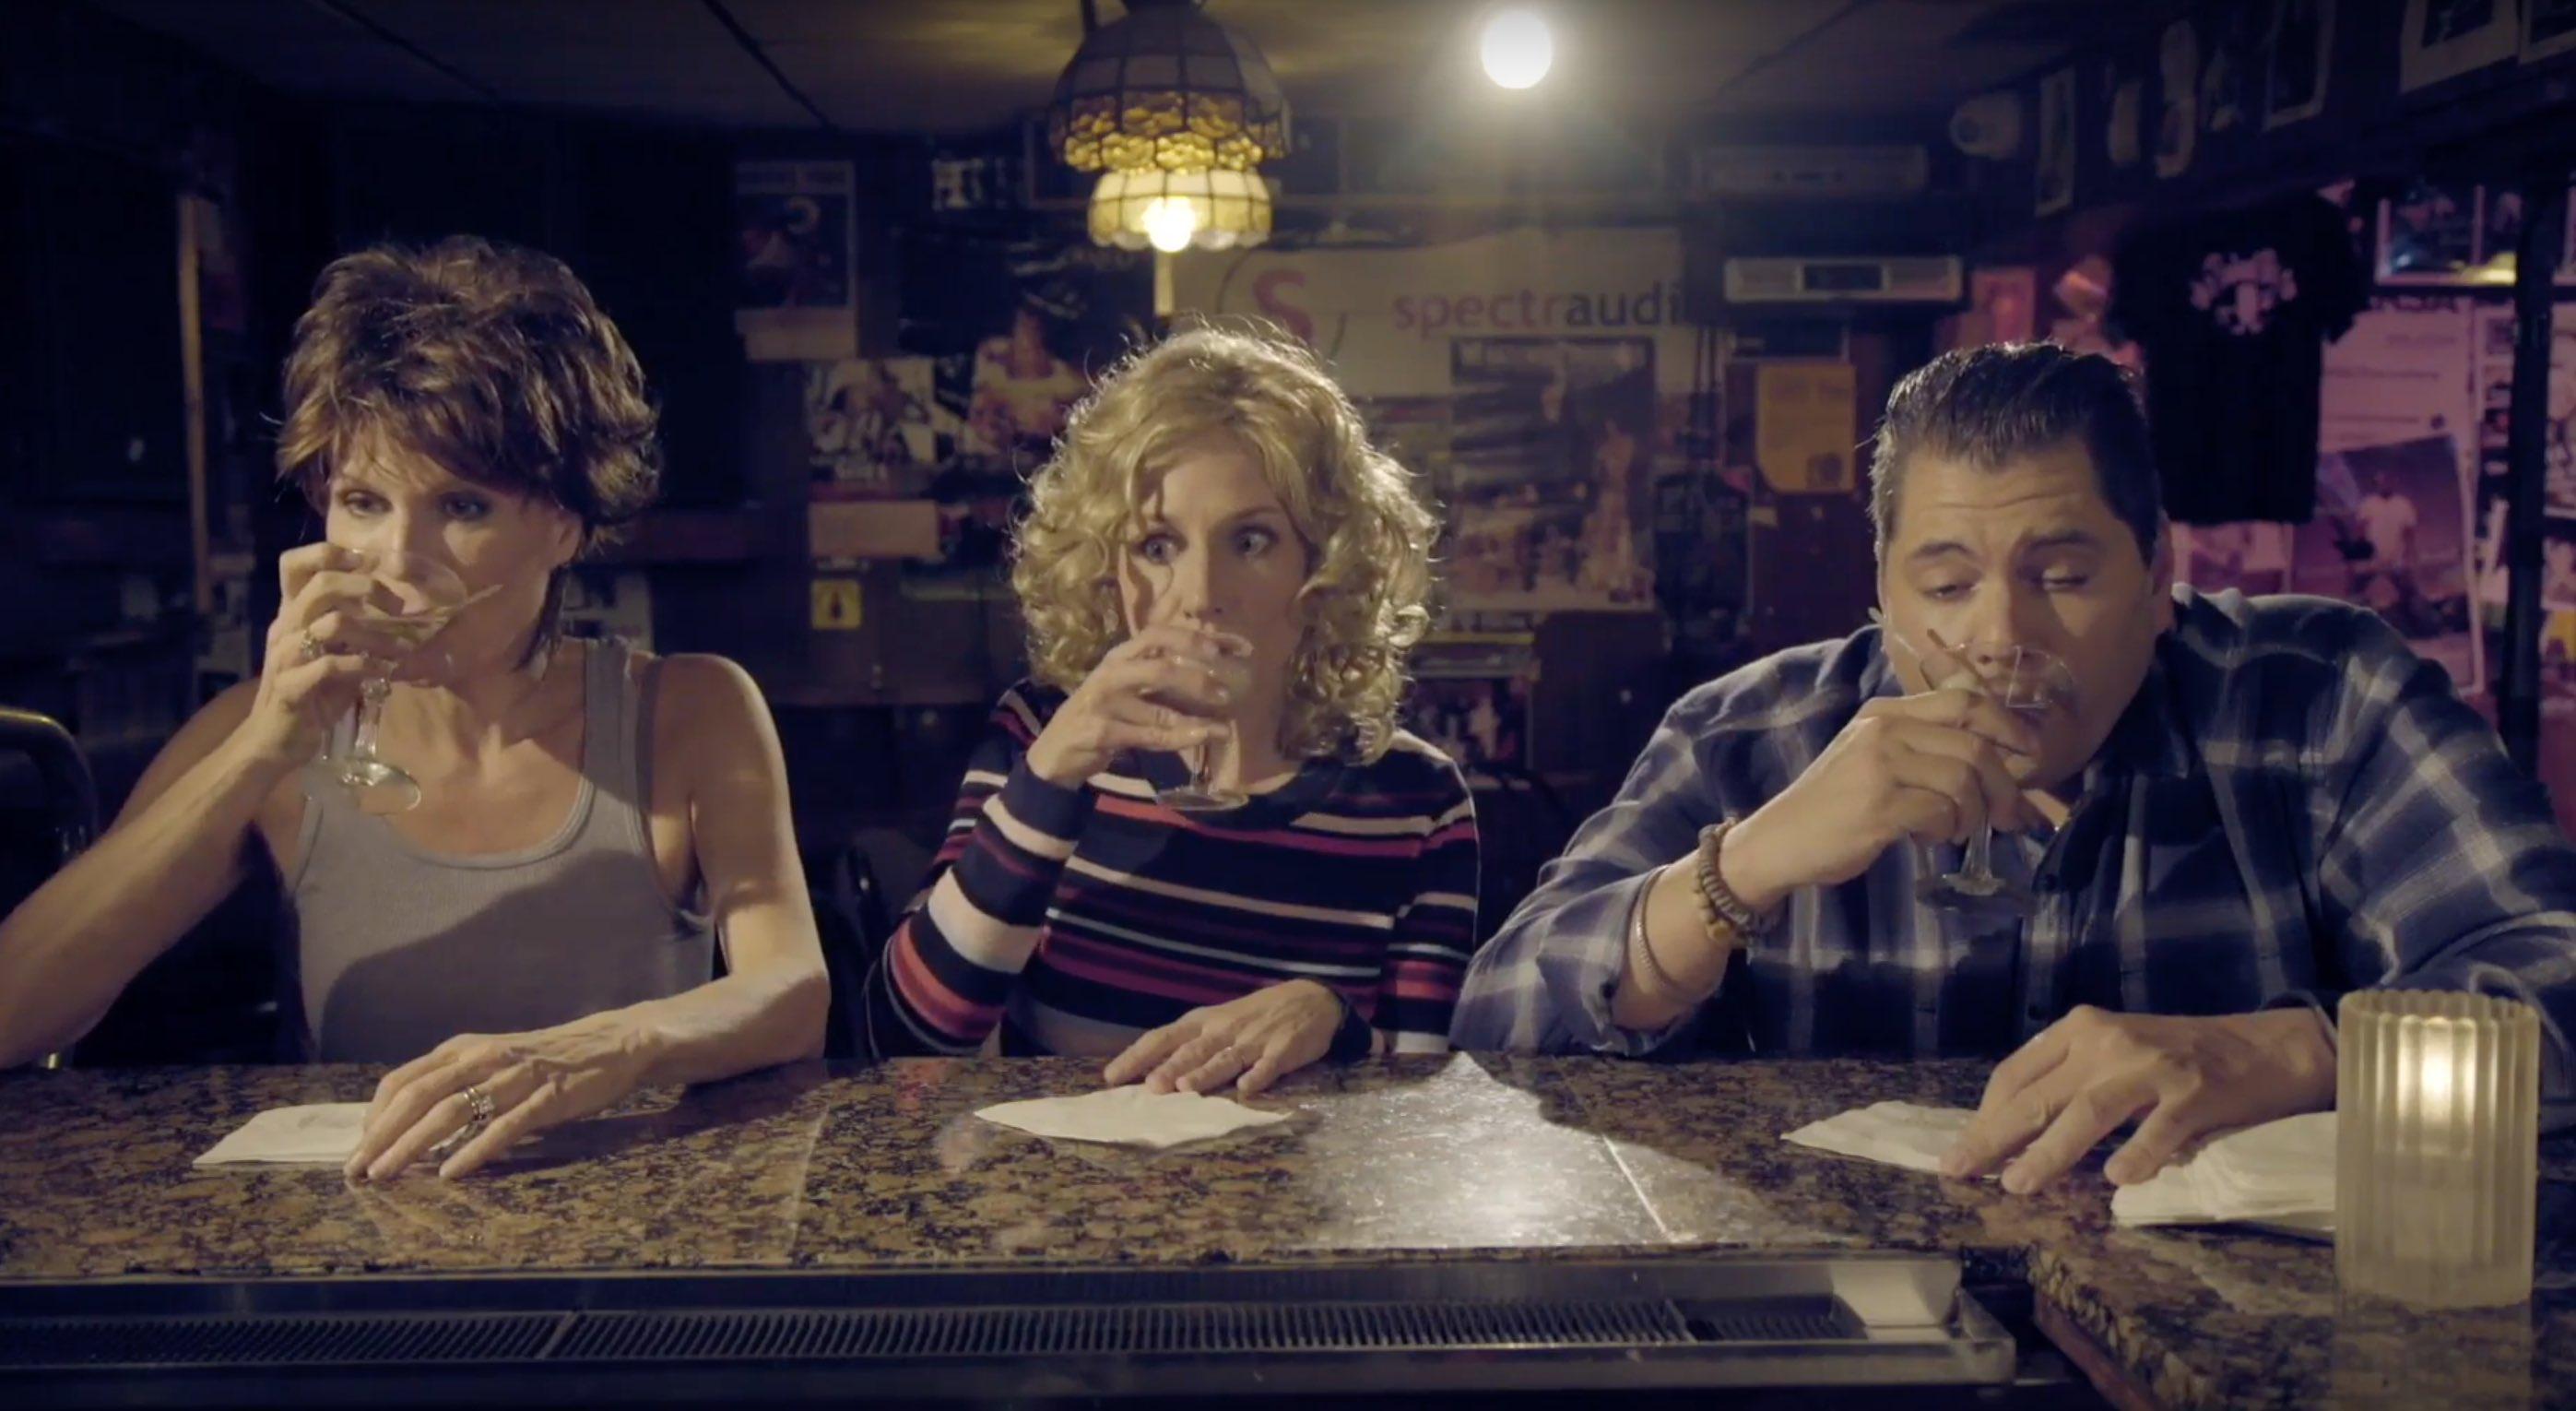 Pamela Gray, Seana Kofoed, and Michael Manuel in Borderline Talent (2018)